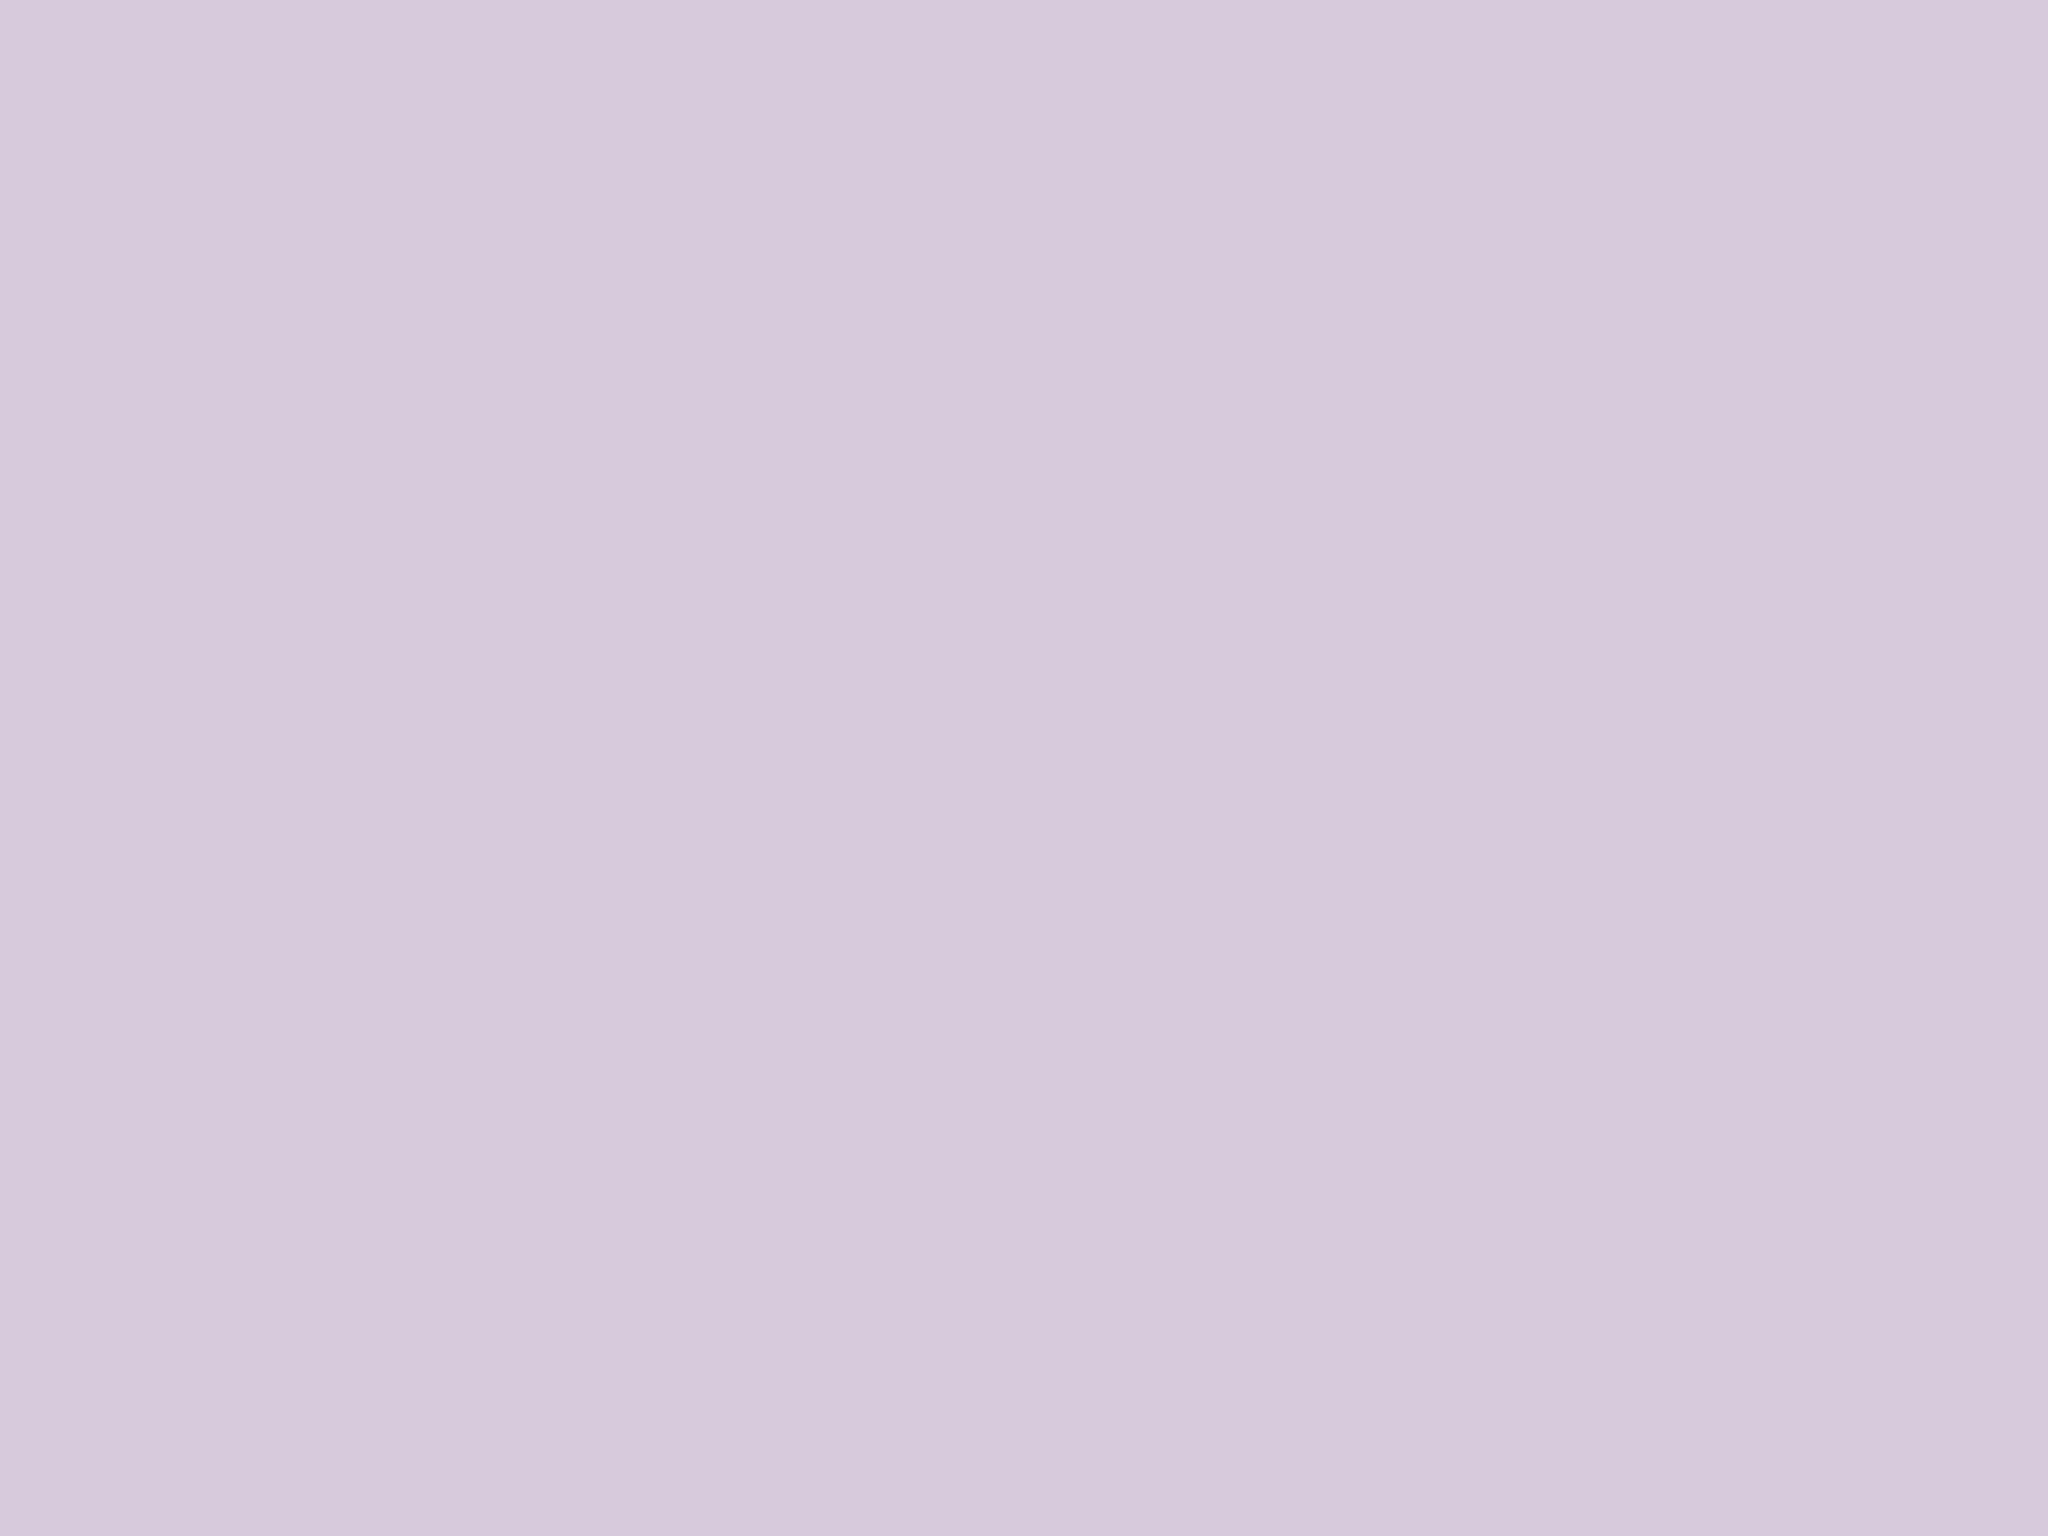 2048x1536 Languid Lavender Solid Color Background